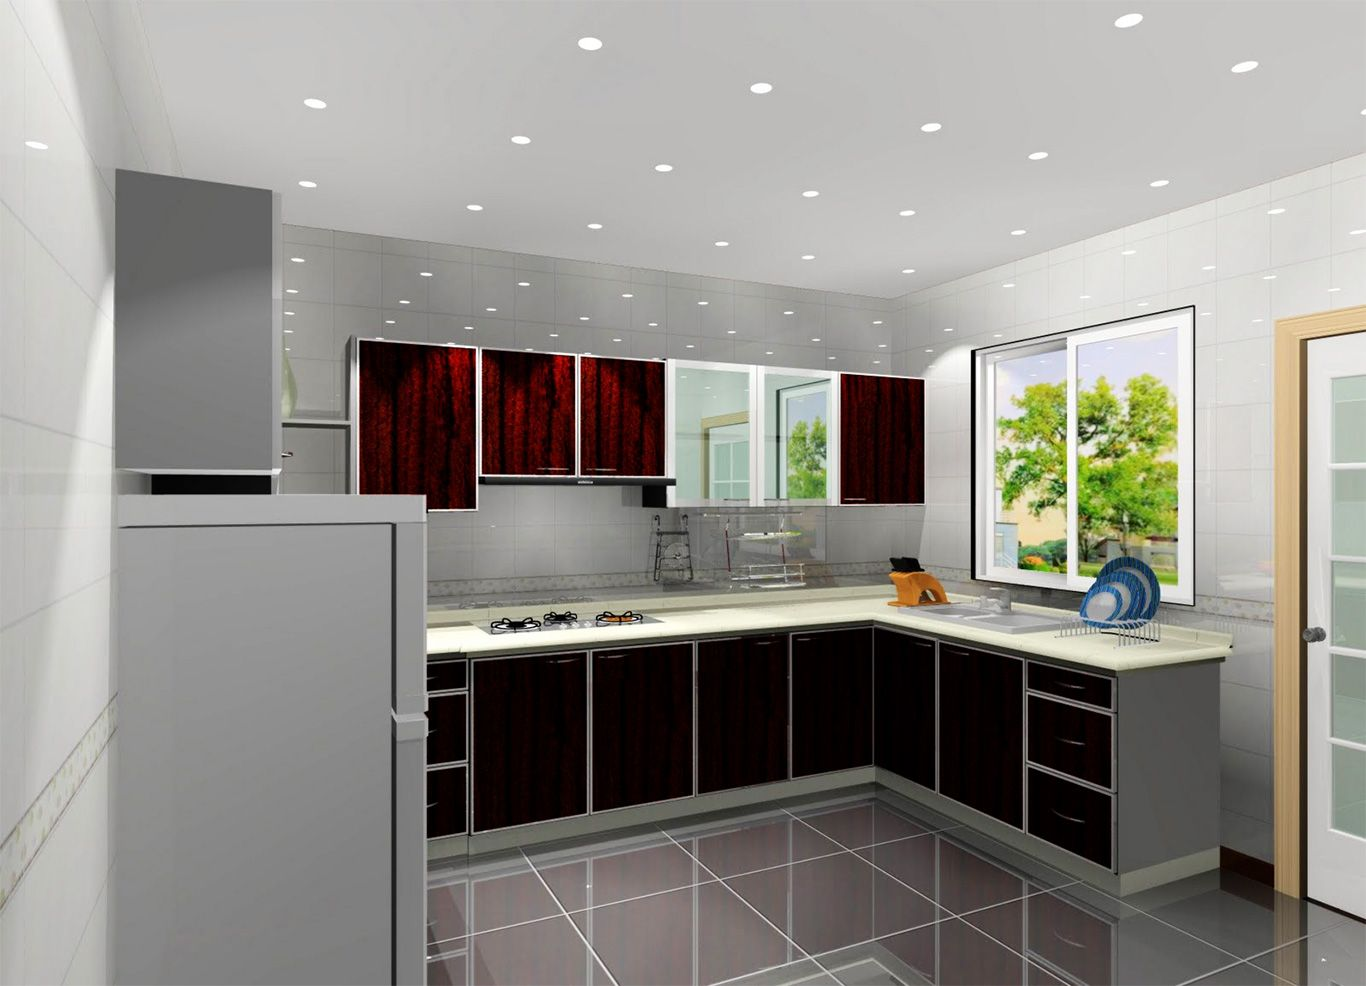 Kitchen Design Software | Home Decor | Pinterest | Cabinet design ...